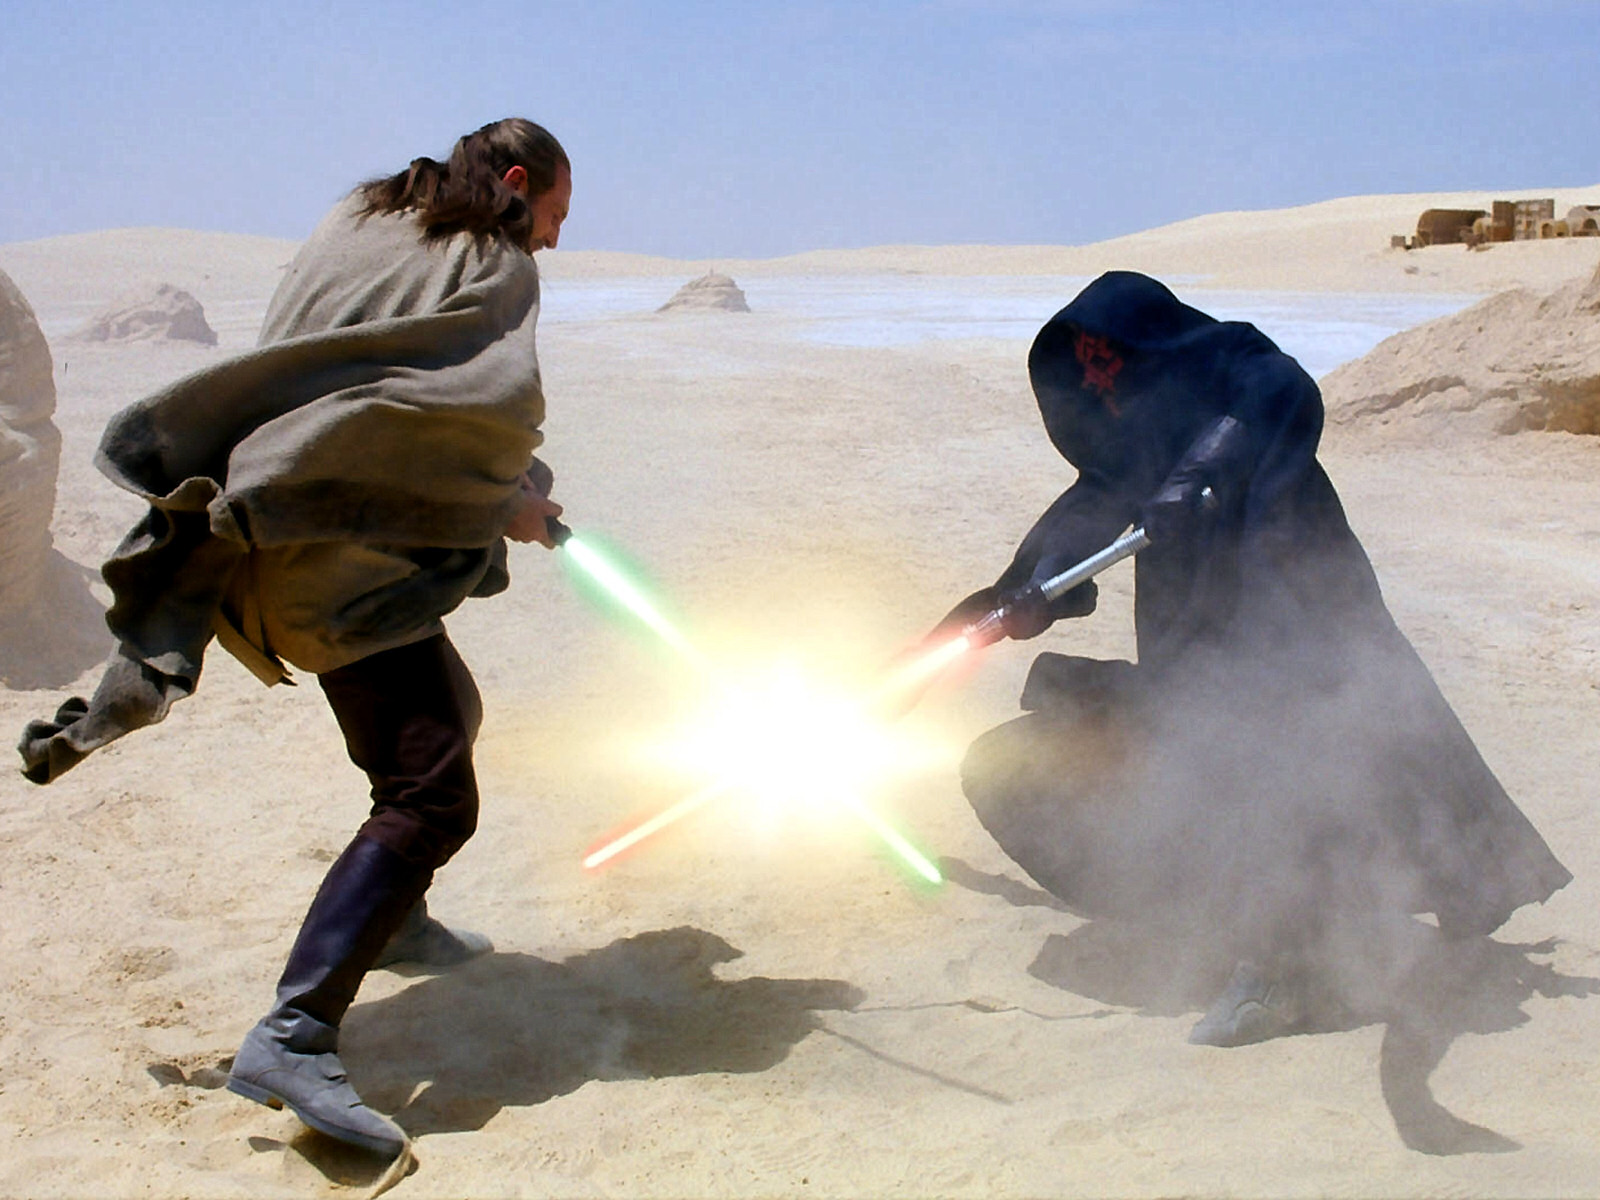 Darth Maul surprises Qui-Gon Jinn on Tatooine